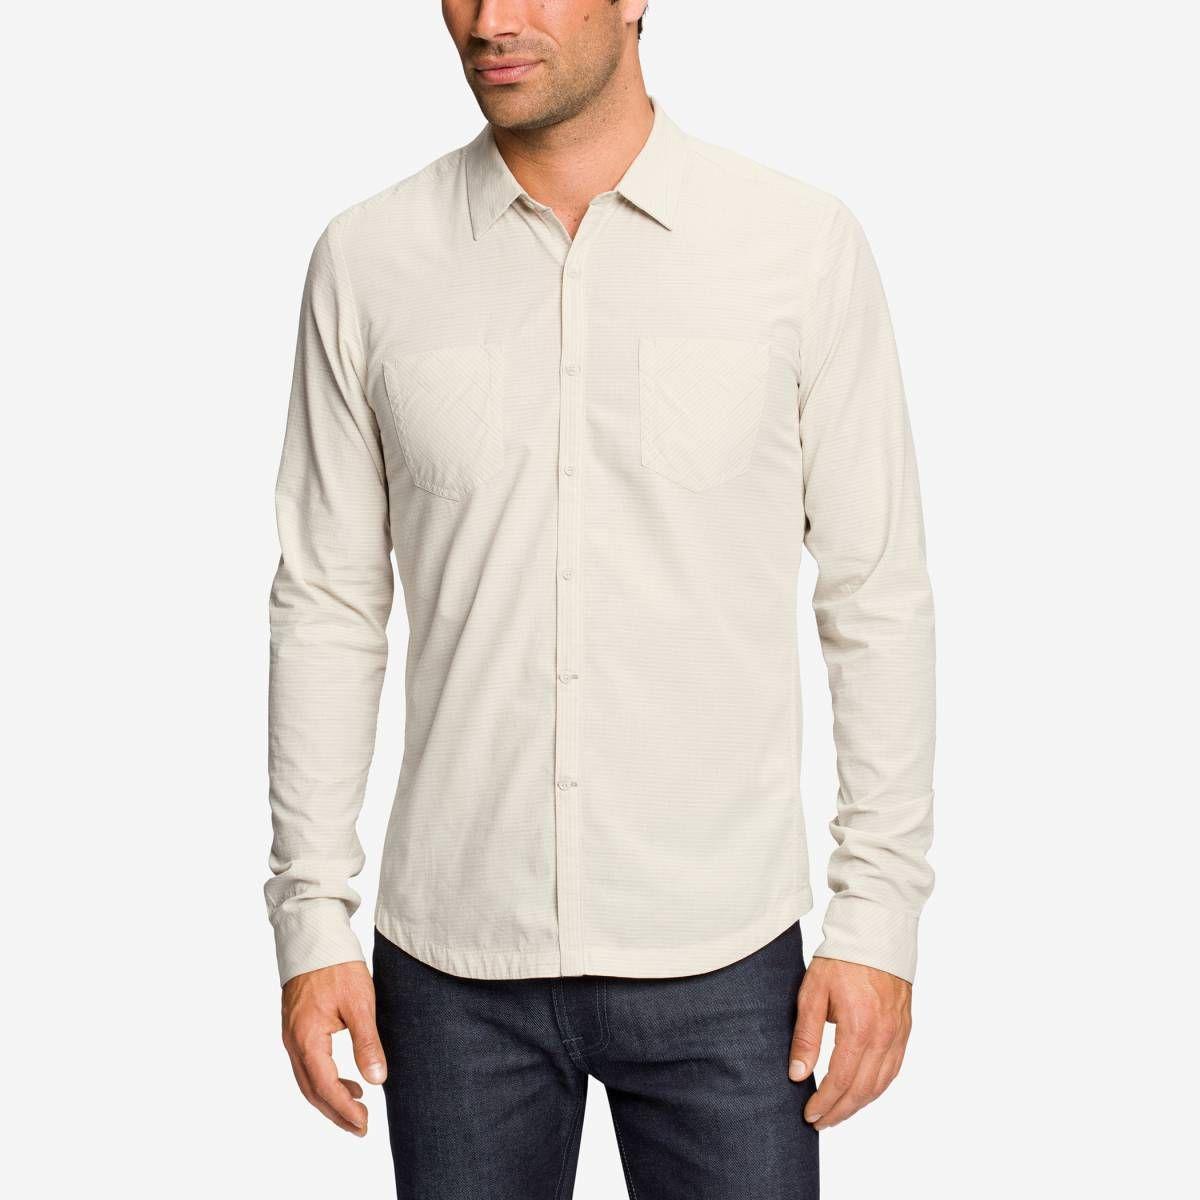 Menus barre long sleeve shirt nau clothing ideas for the man